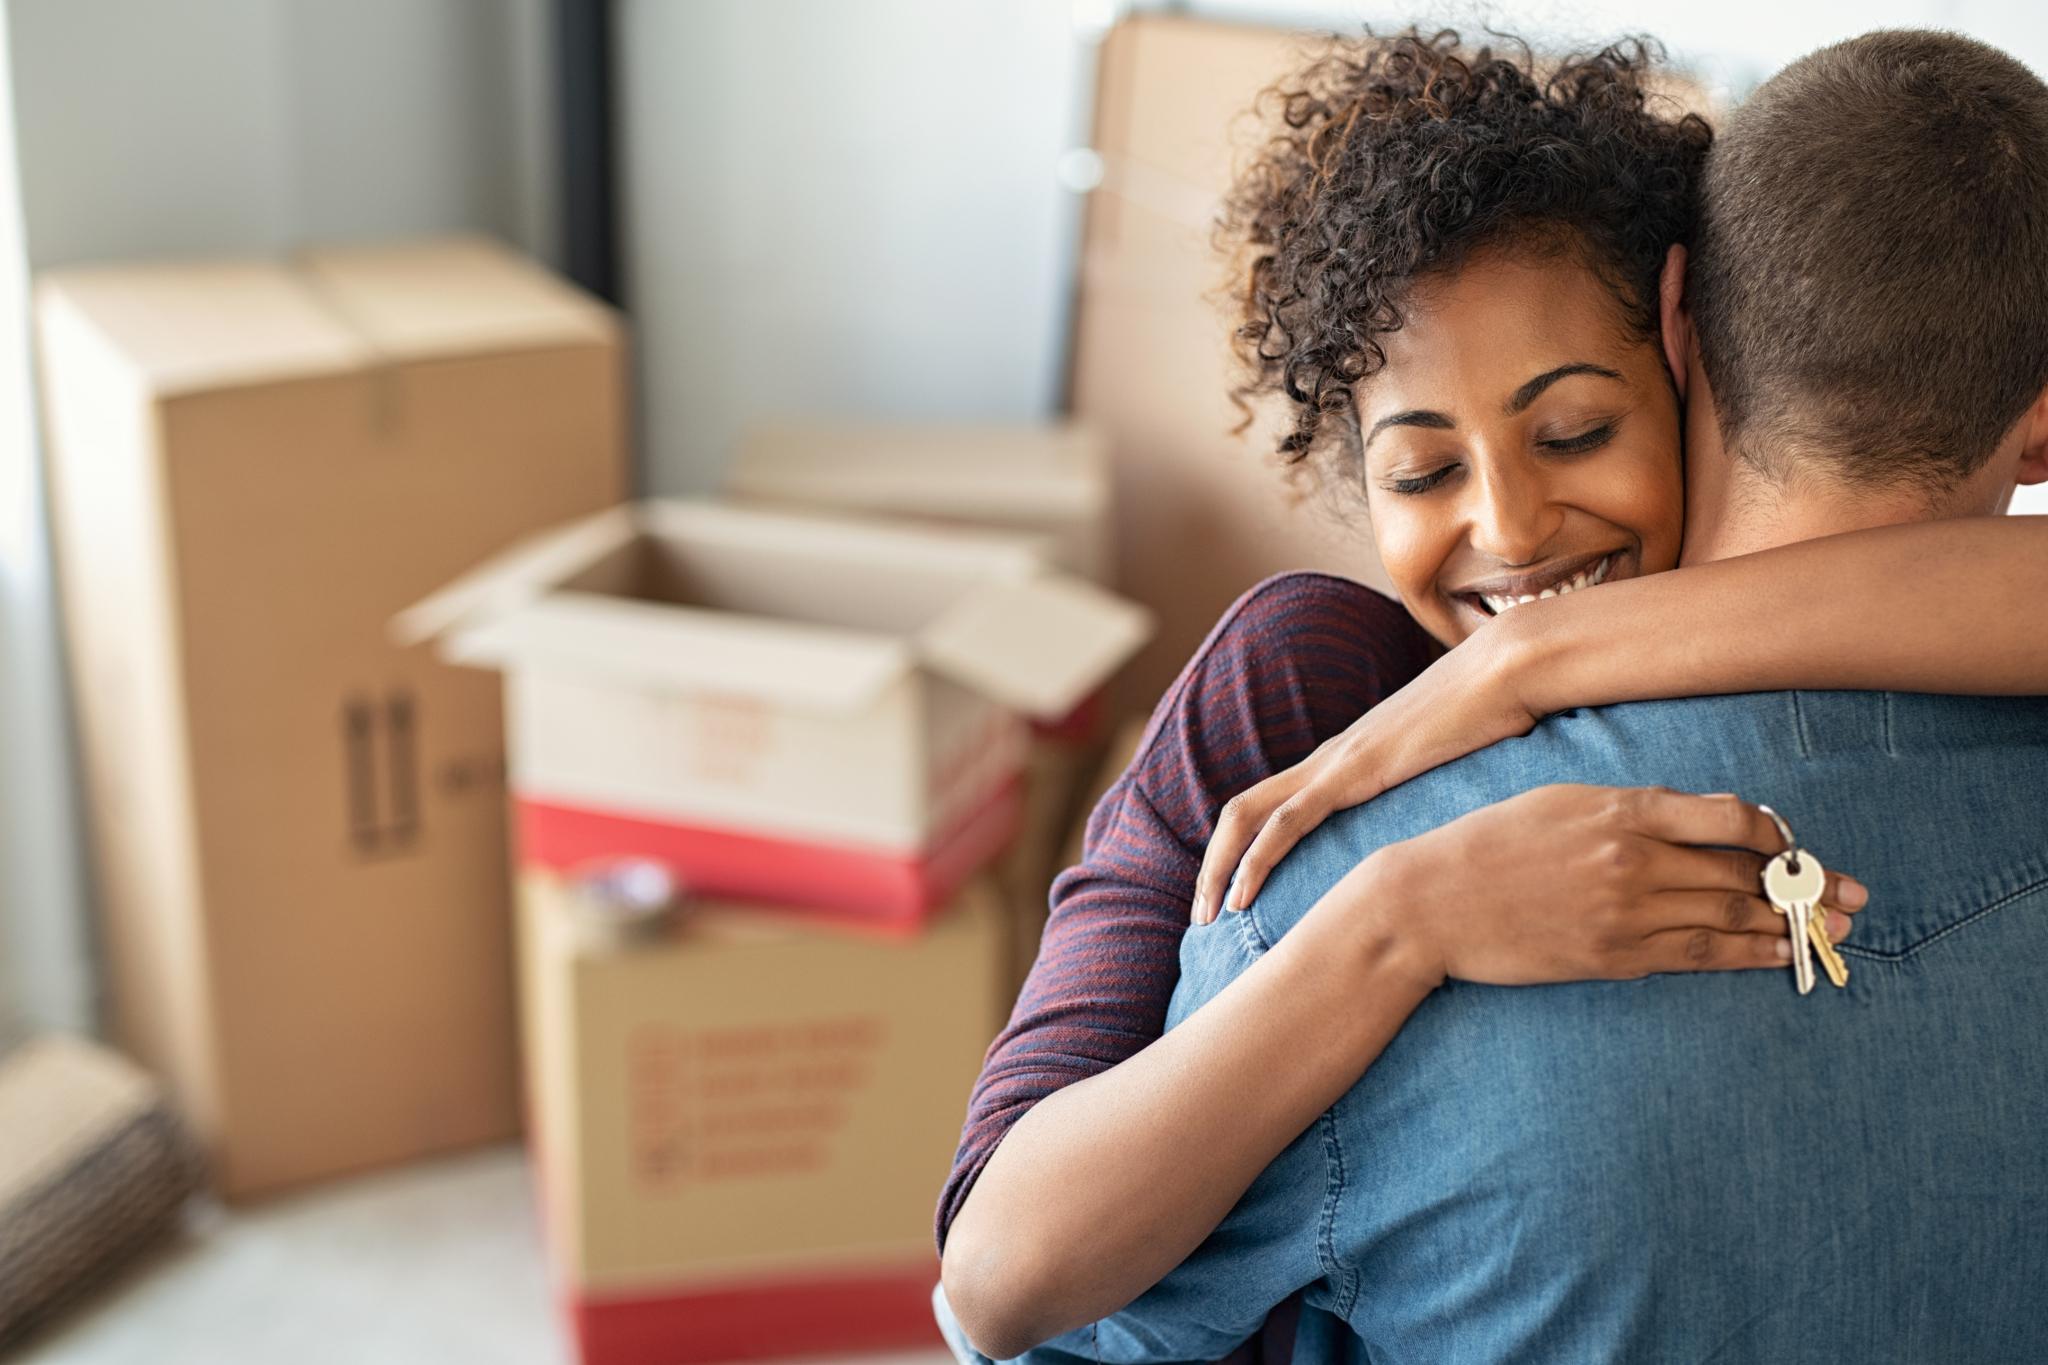 95% LVR Home Loan